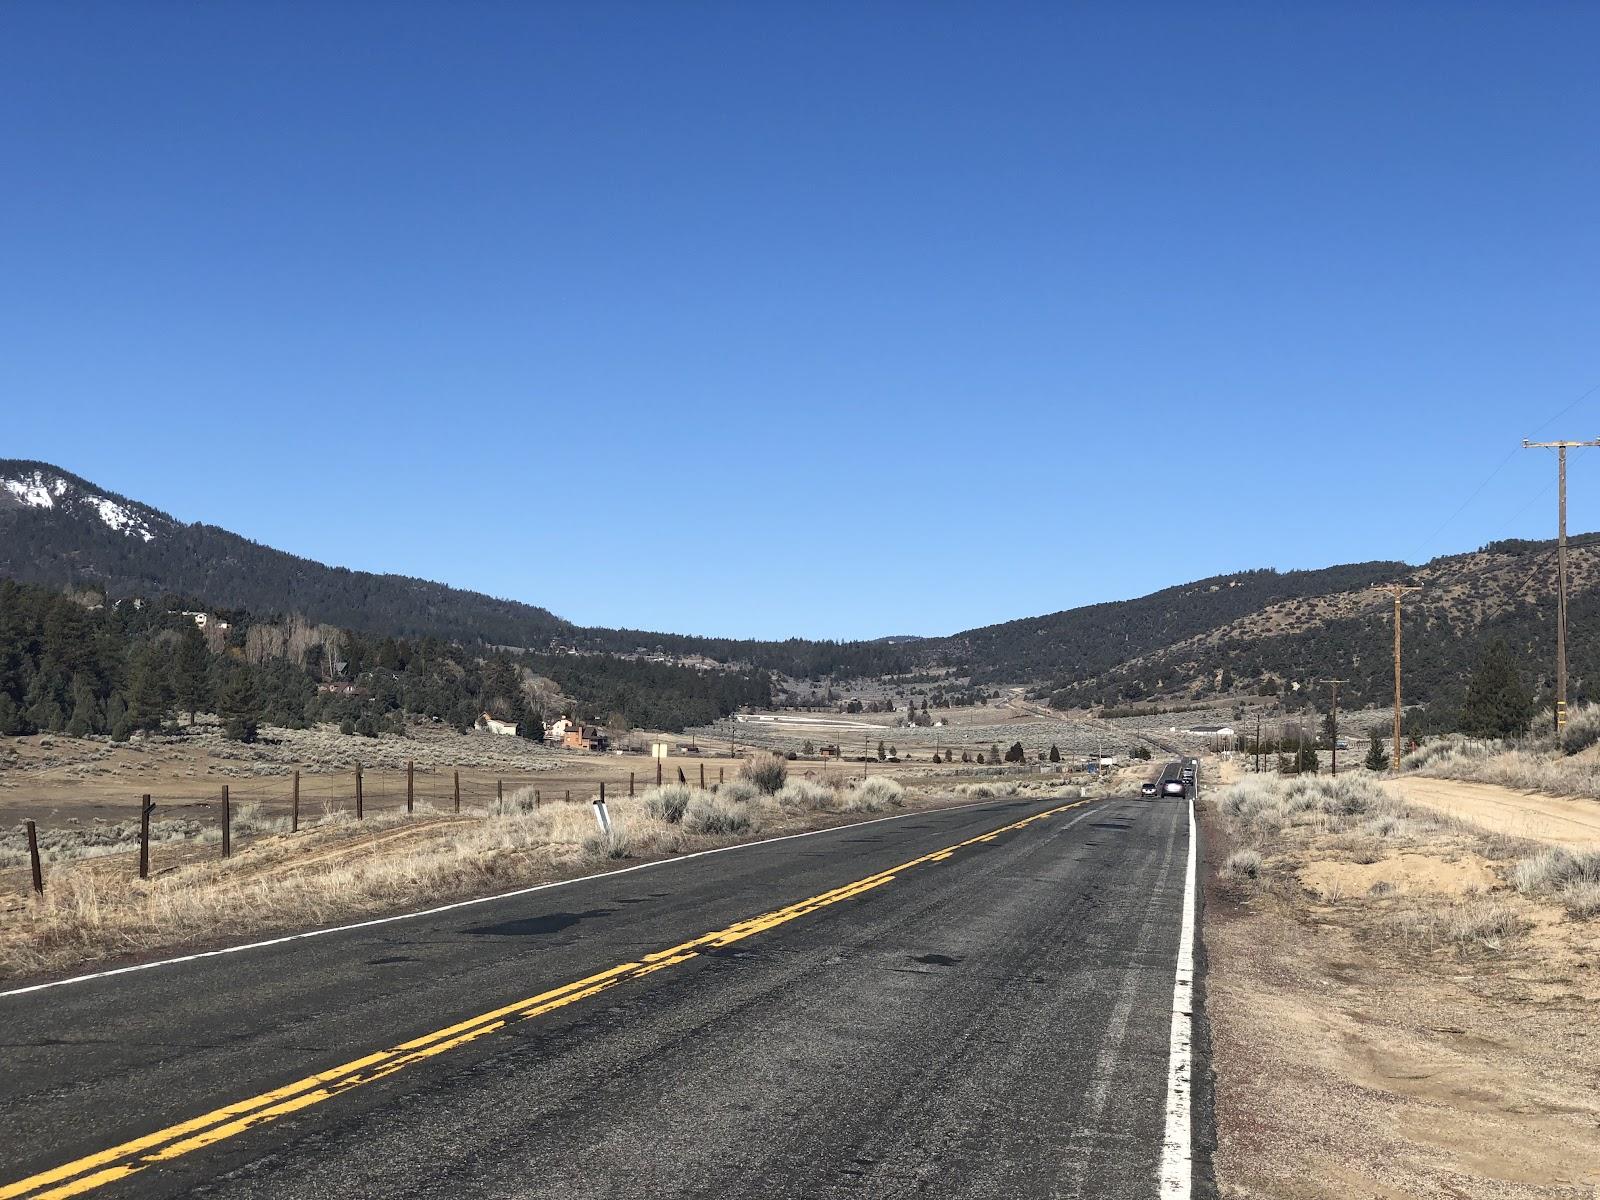 Bike climb Mt. Pinos - Cuddy Road, mountains behind